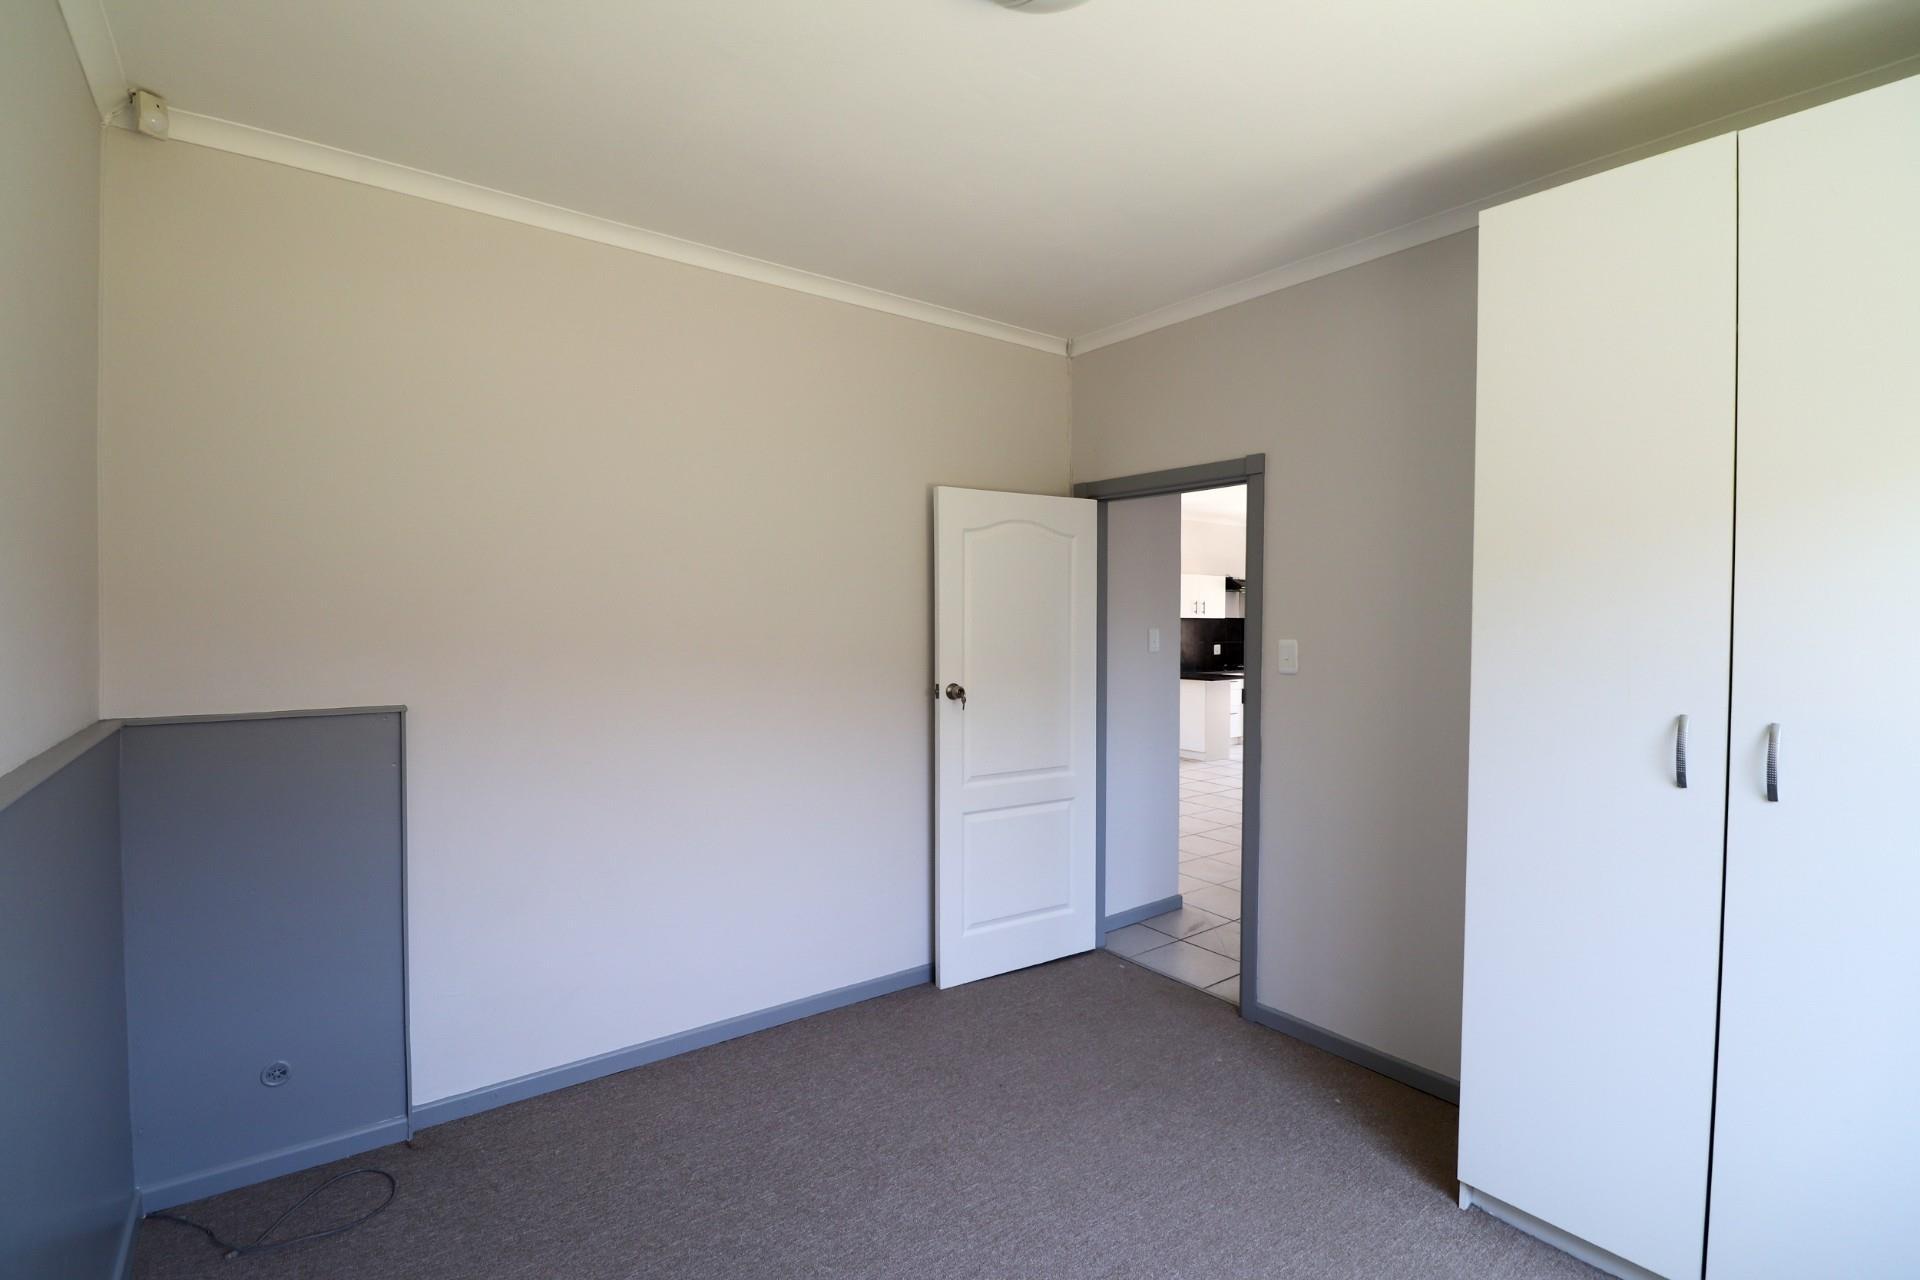 3 Bedroom Townhouse For Sale in Oatlands North